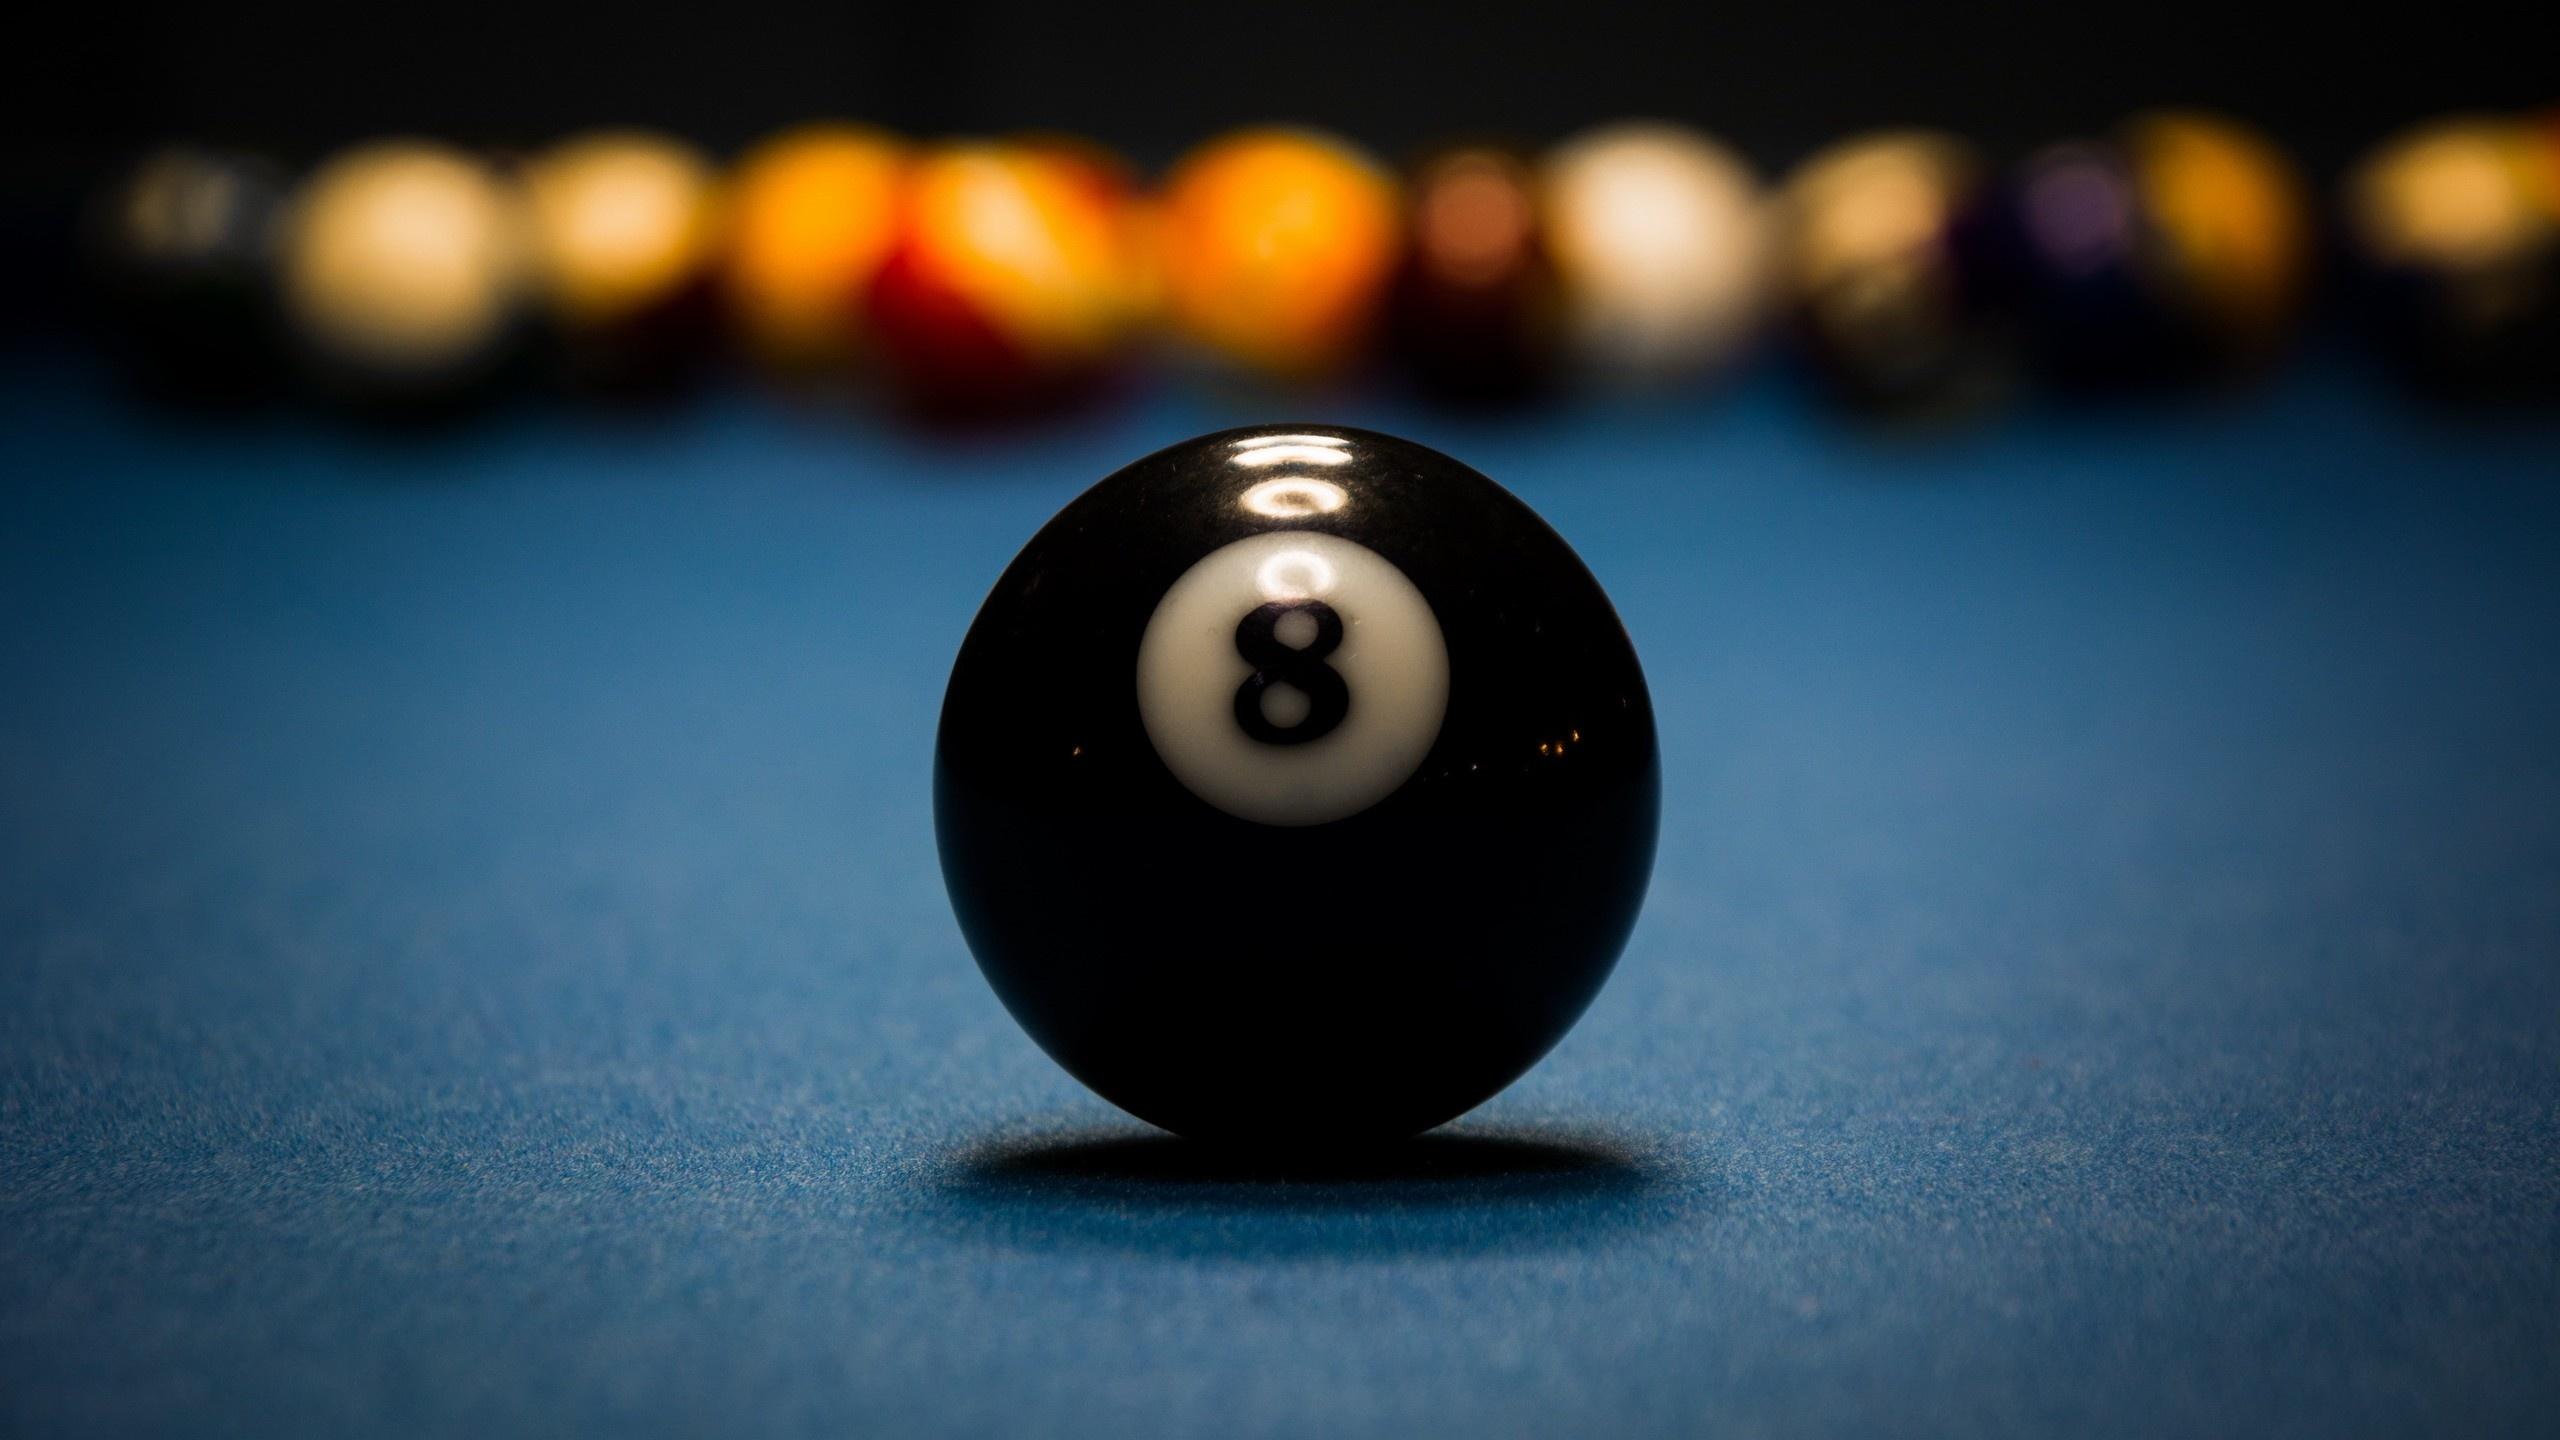 Billiard Ball On Table Wallpaper